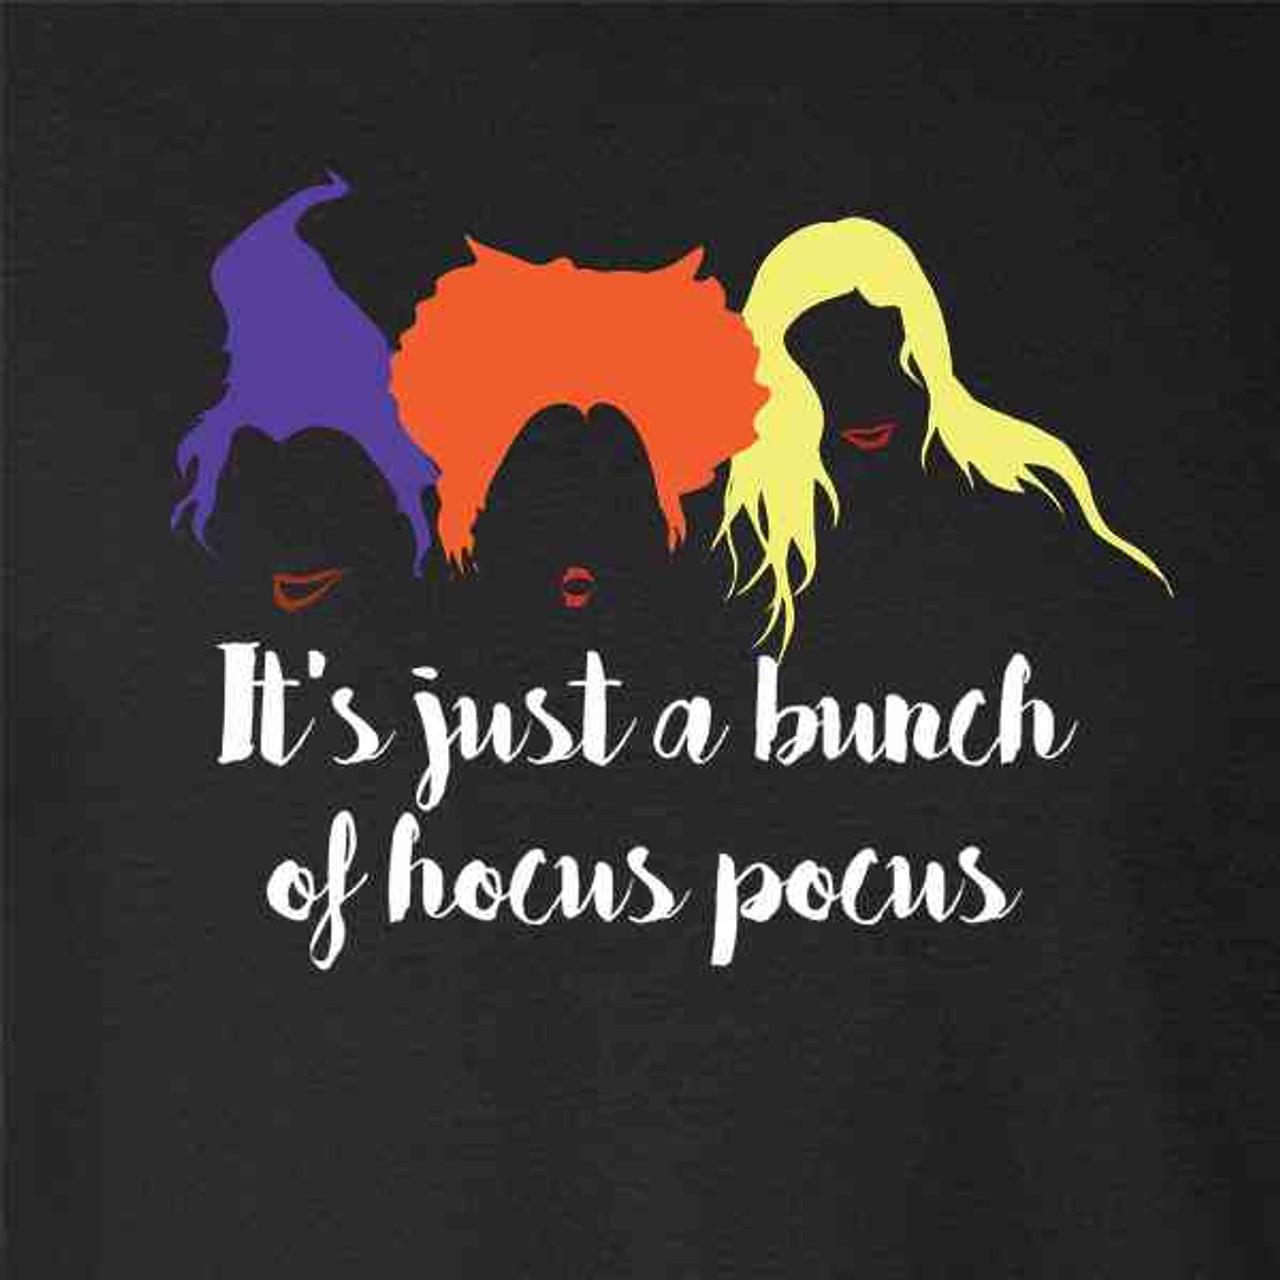 942f1c2b393c It's Just A Bunch of Hocus Pocus Halloween Costume - Pop Threads